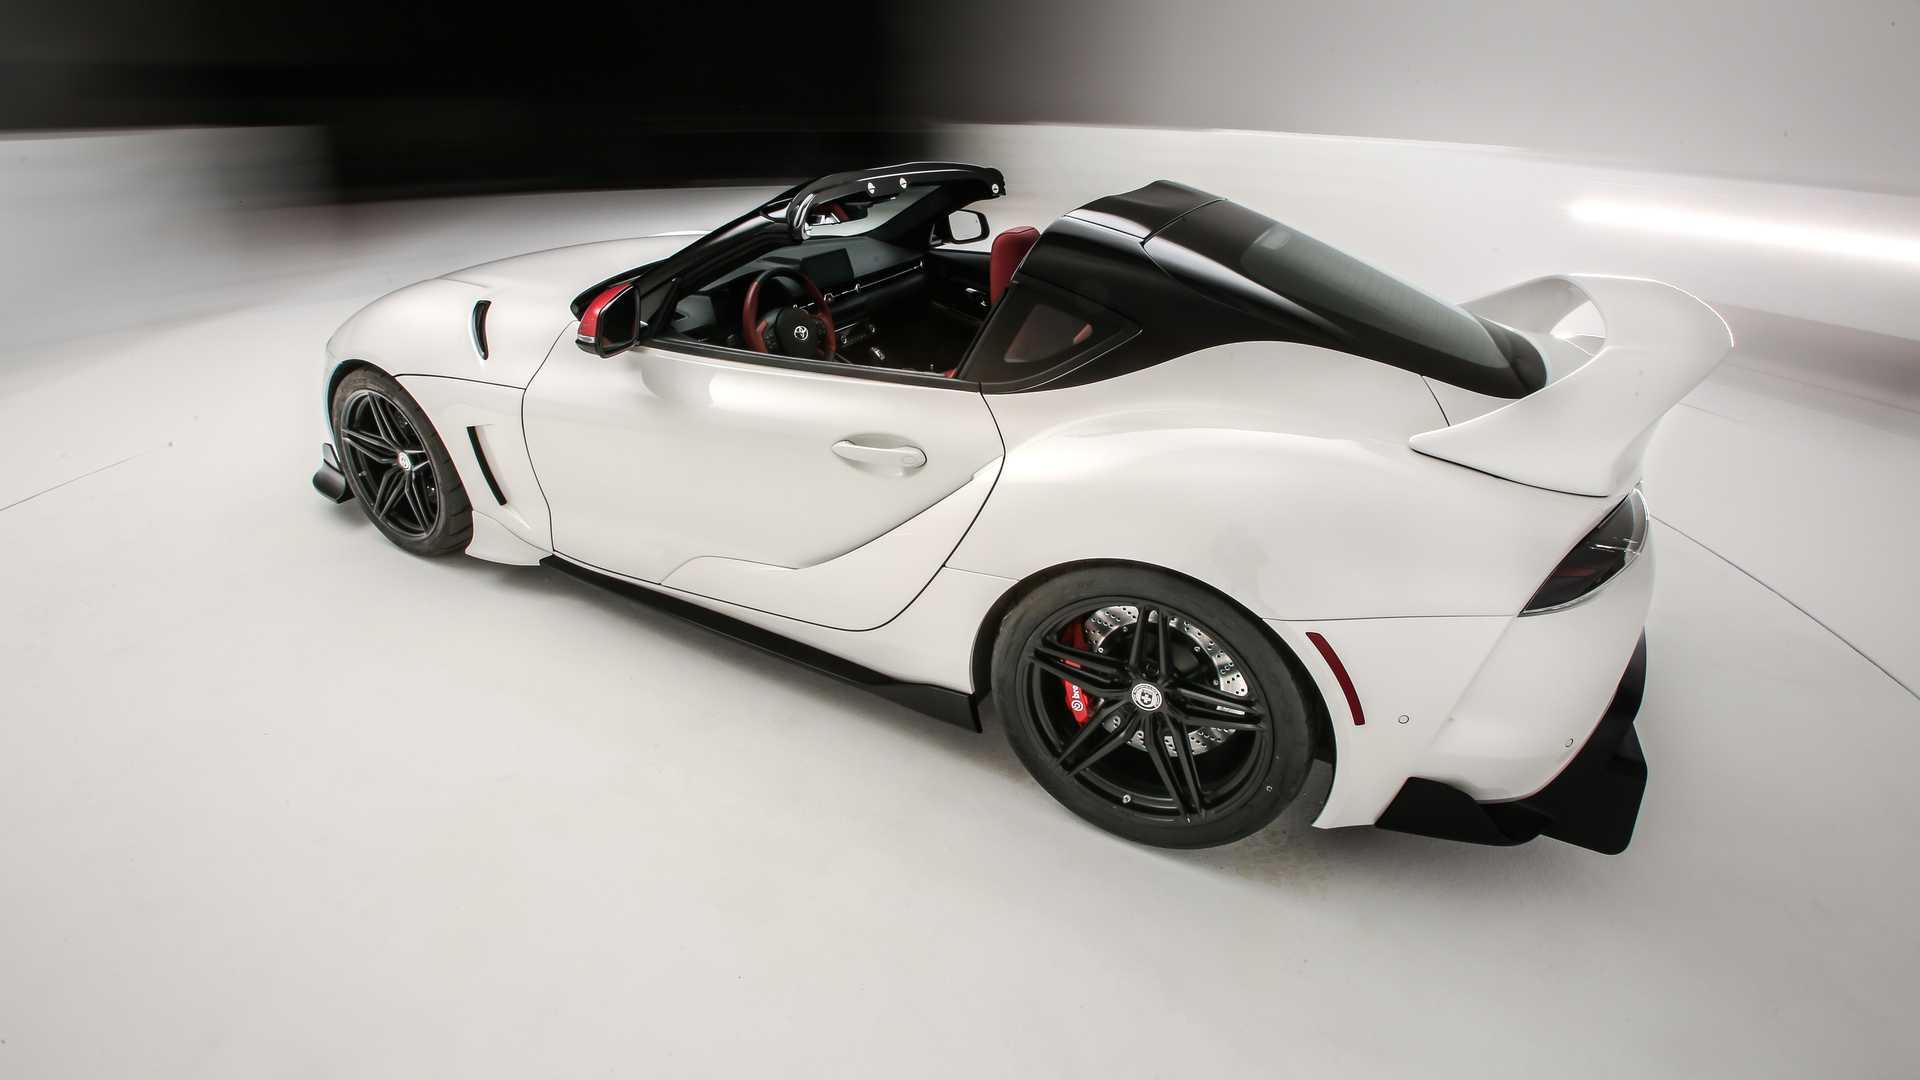 Toyota GR Supra Sport Top Concept